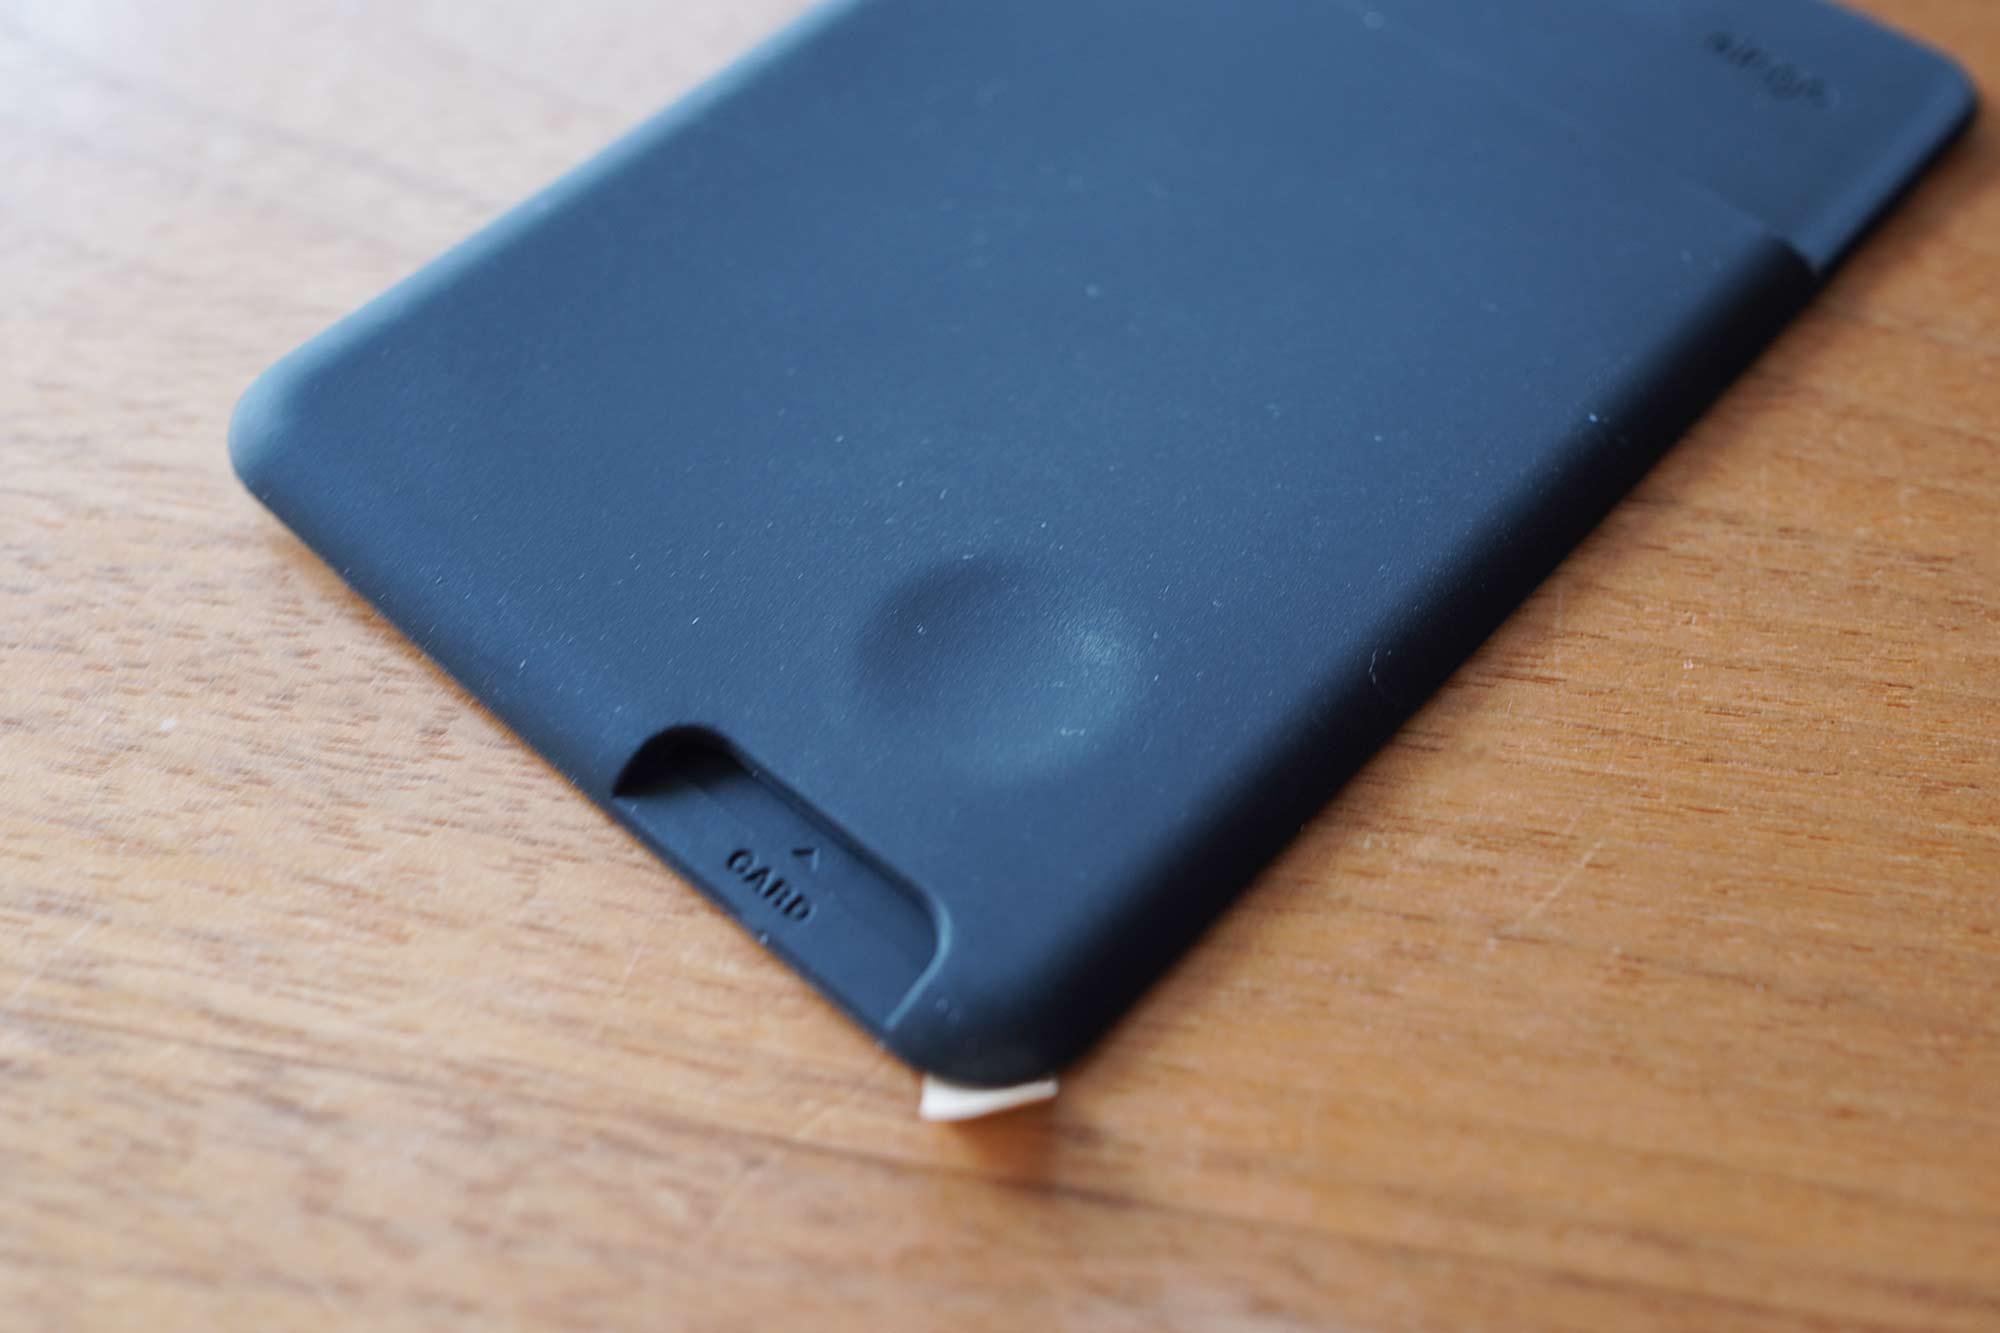 elago,背面ポケット,カードホルダー,カードポケット,お洒落,使いやすい,安い,交通系ICカード